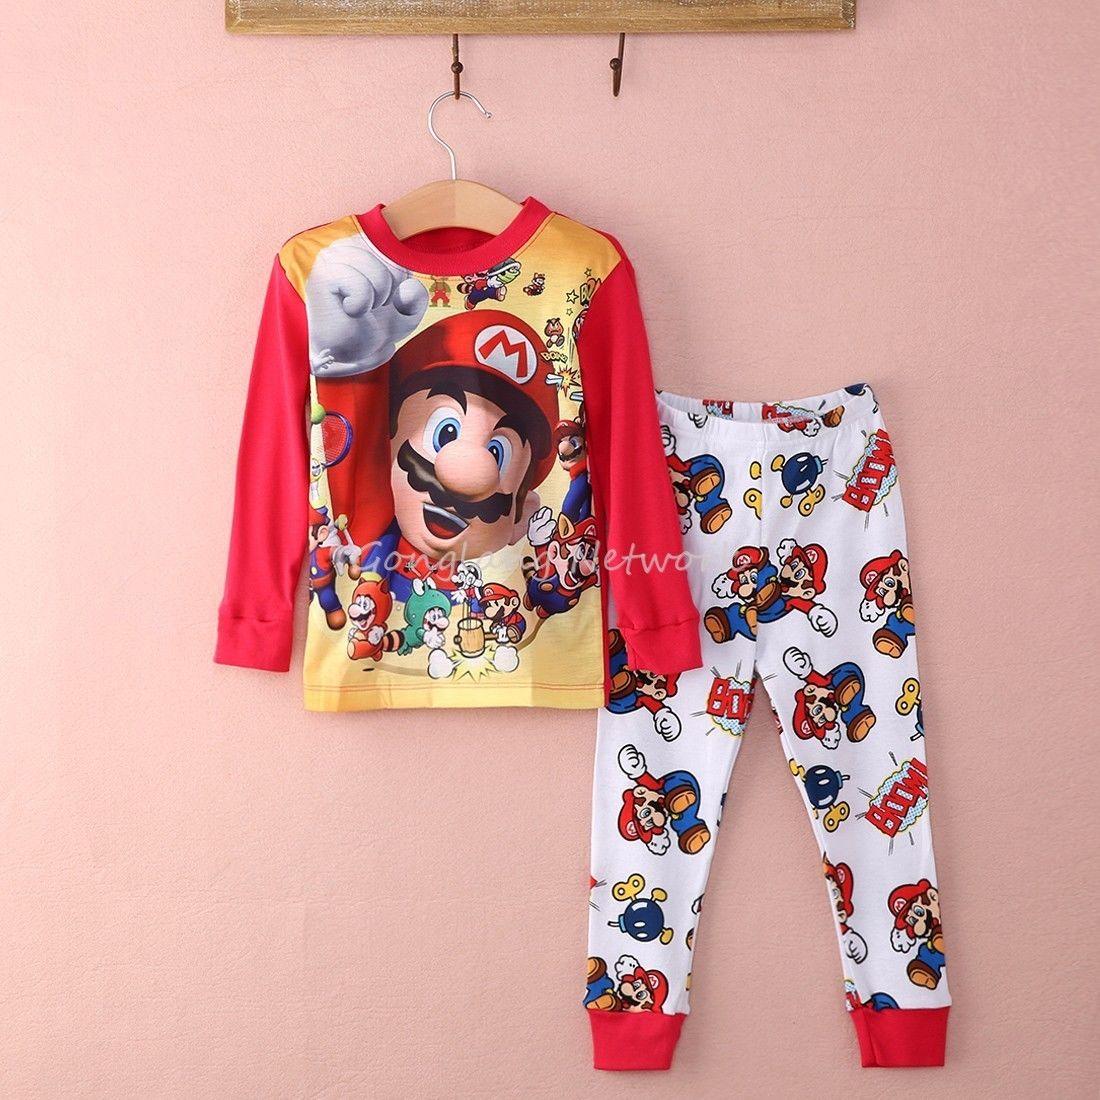 Juliuse Marthar Sleepwear Gray Elephant Soccer Cartoon Baby Onesie Short Sleeve Shirt Outfits